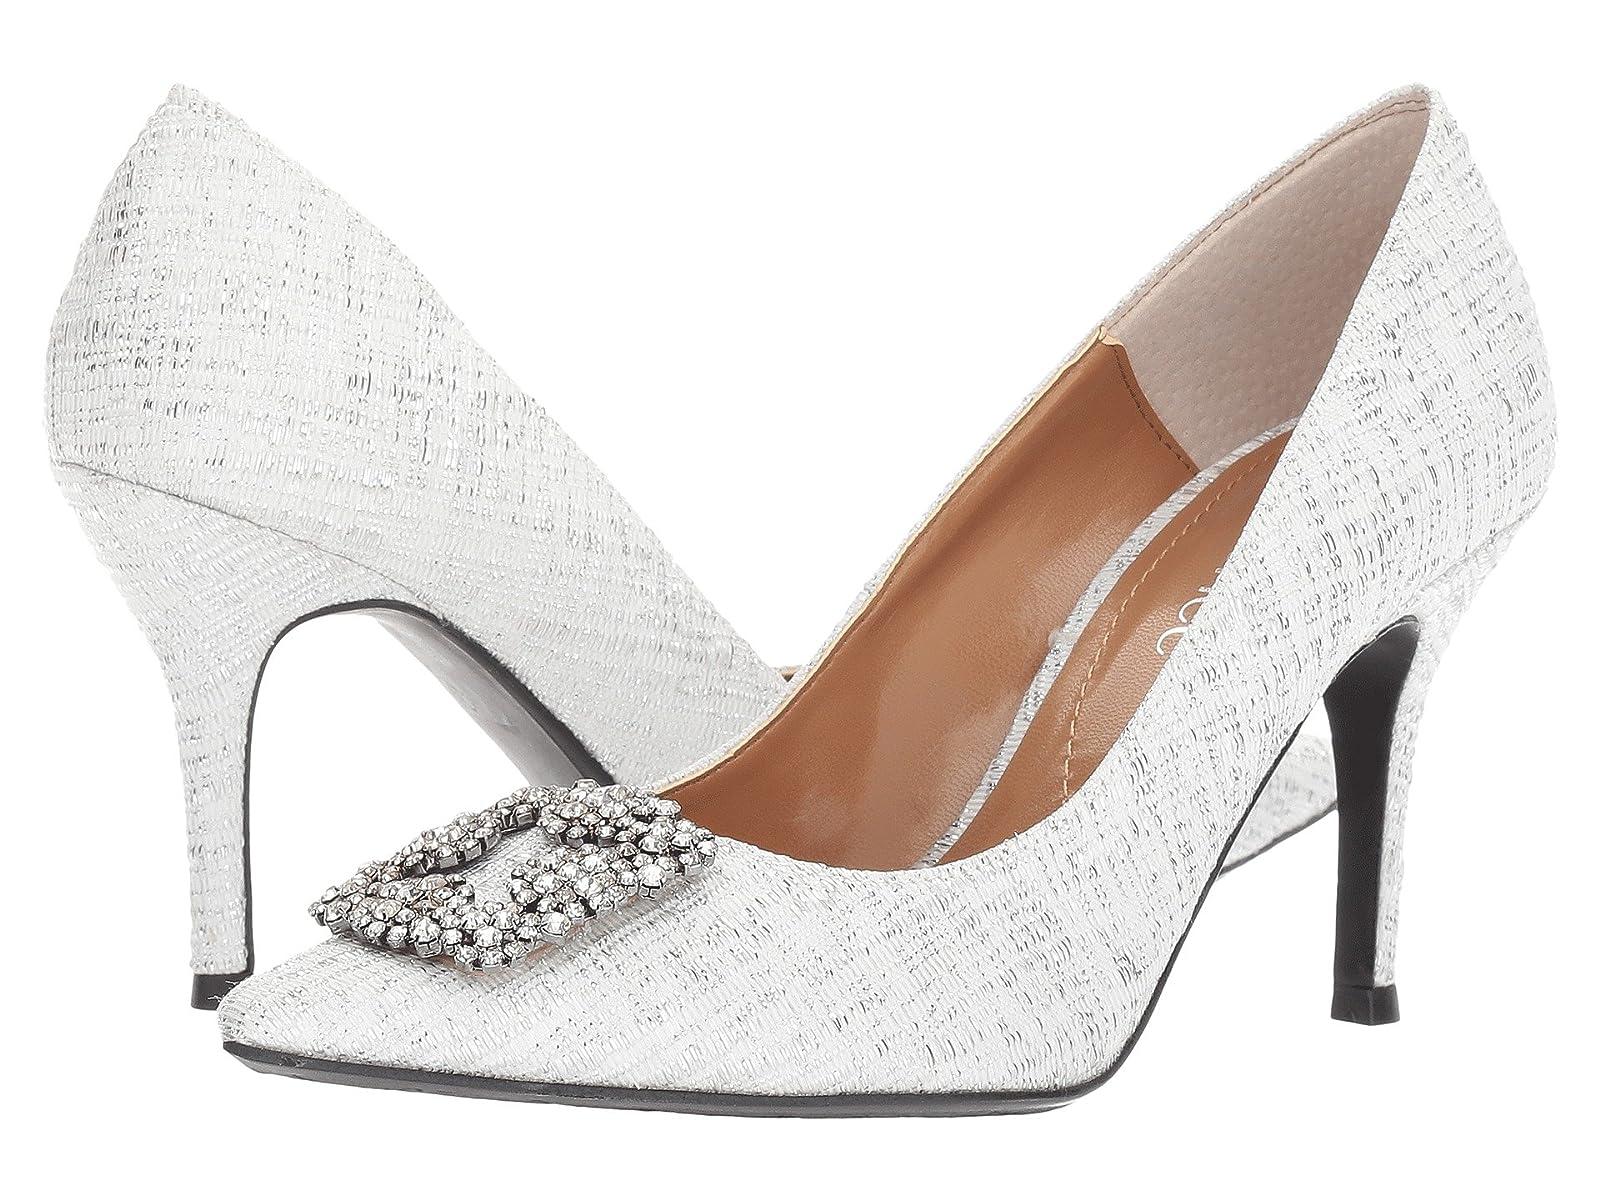 J. Renee BilboaCheap and distinctive eye-catching shoes